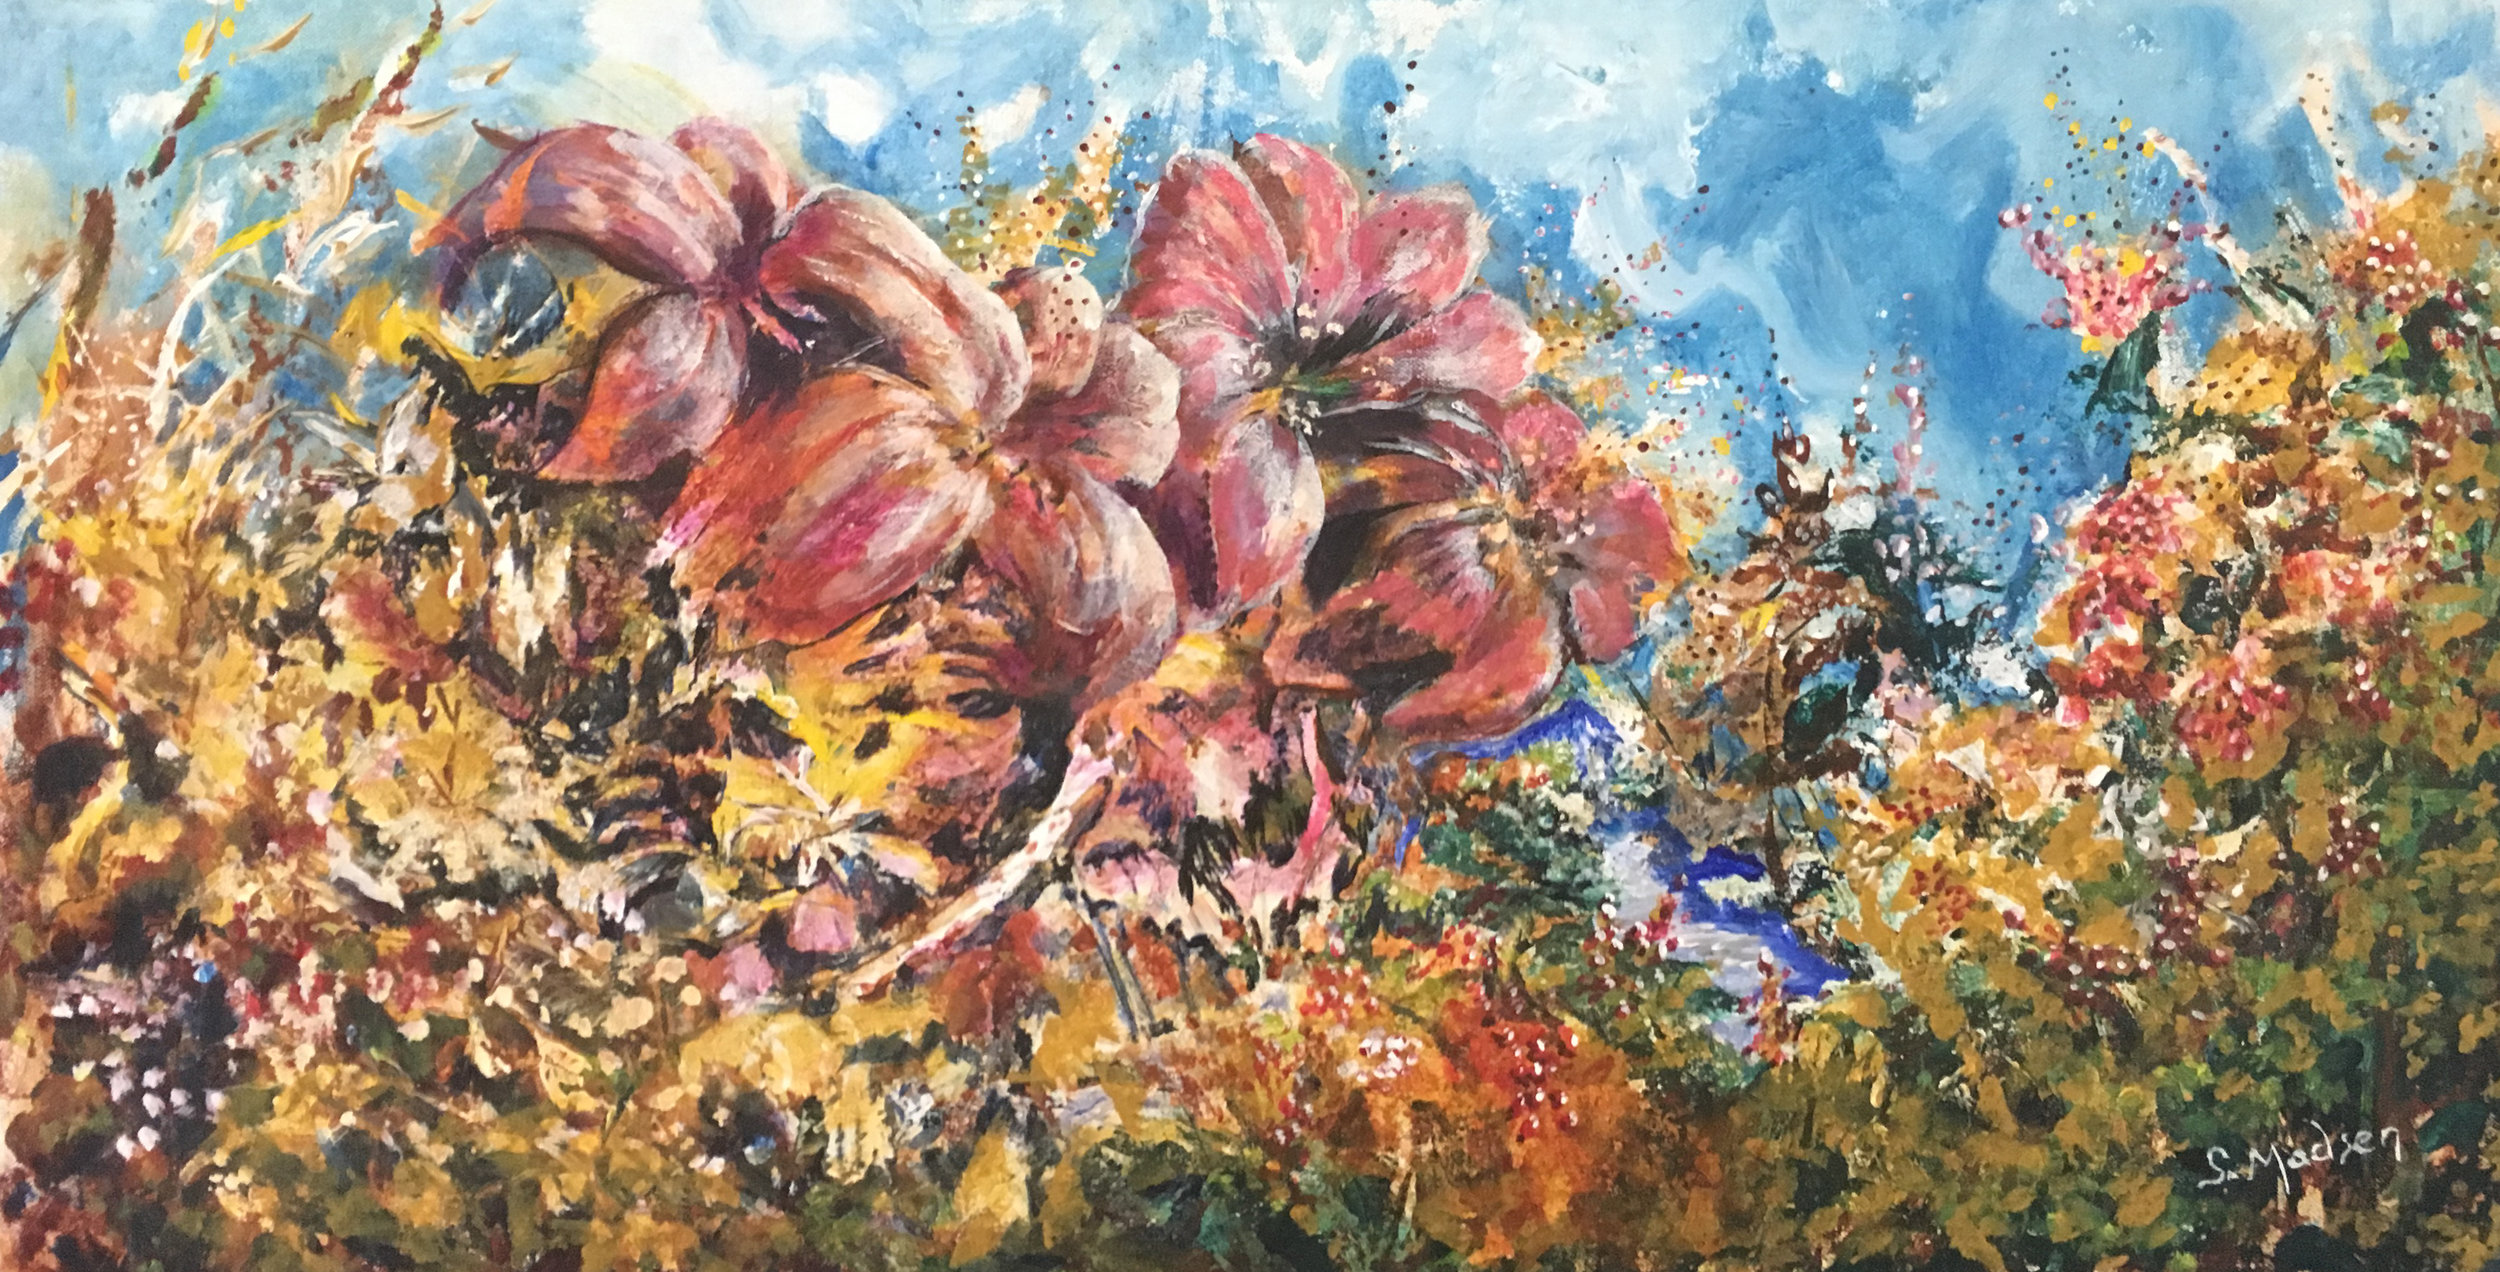 Garden Party 2, Mixed Media on canvas © Shauna Madsen